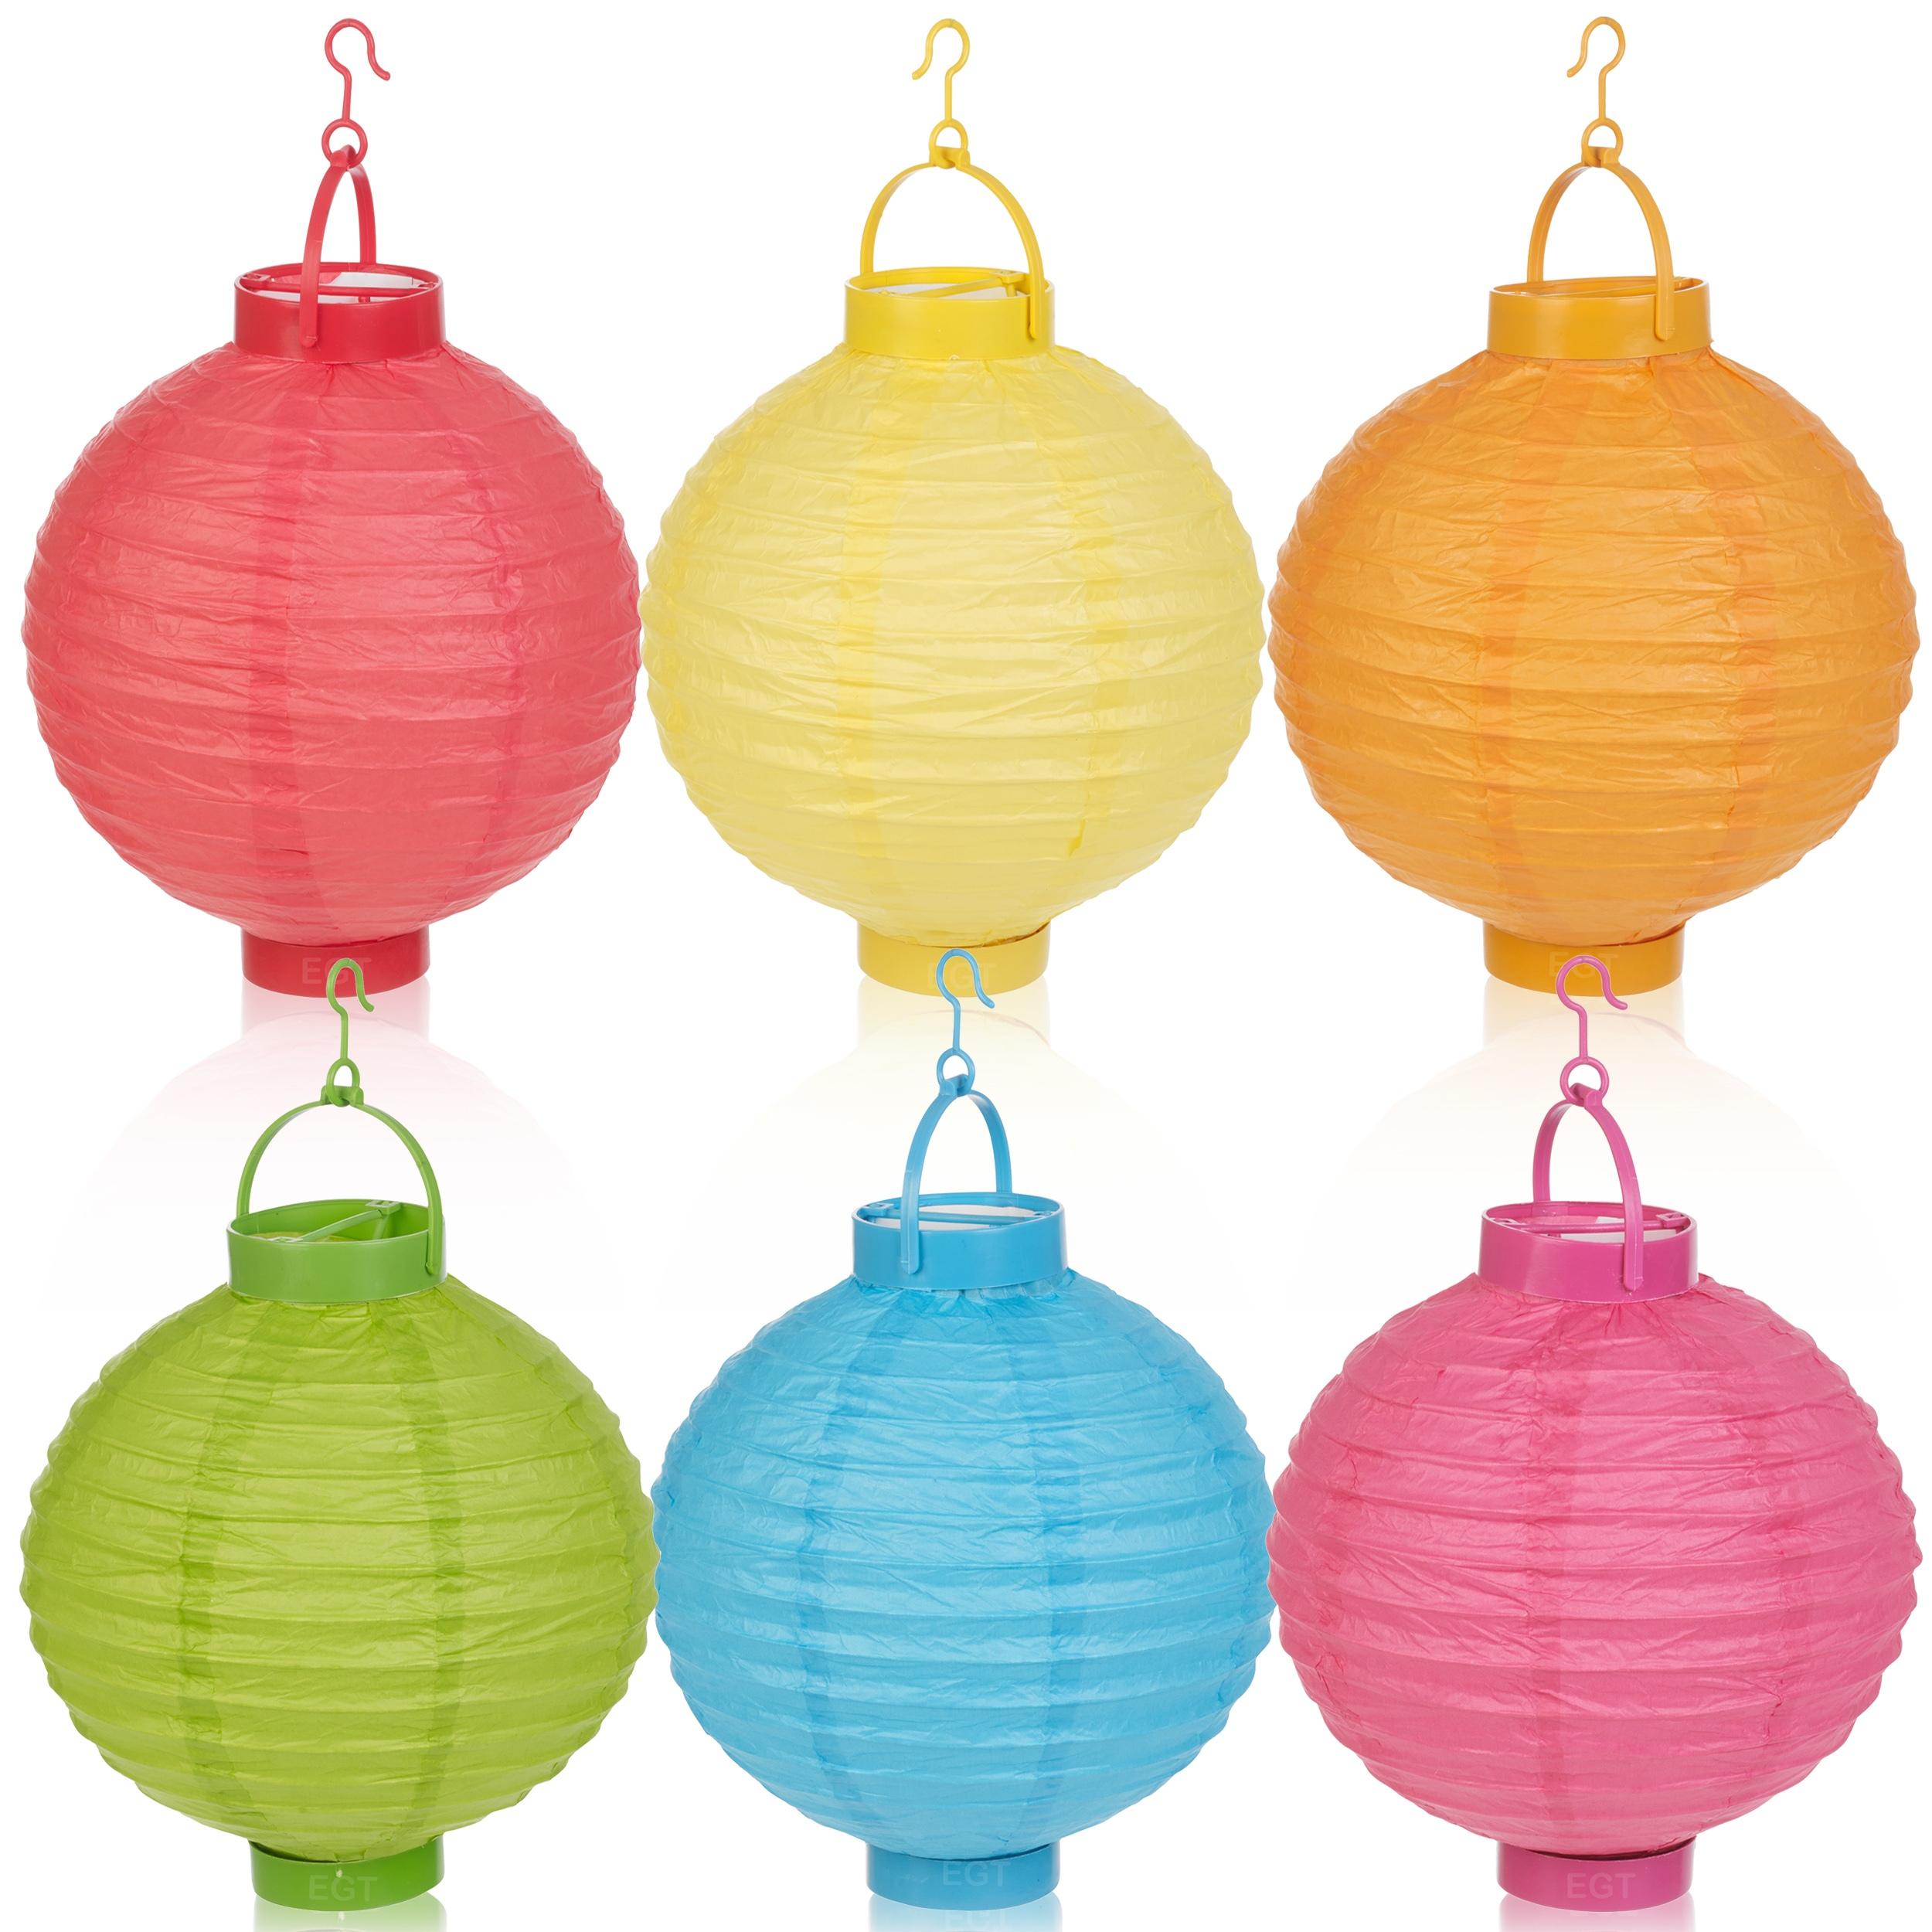 hanging chinese led light paper lantern party wedding xmas decoration. Black Bedroom Furniture Sets. Home Design Ideas